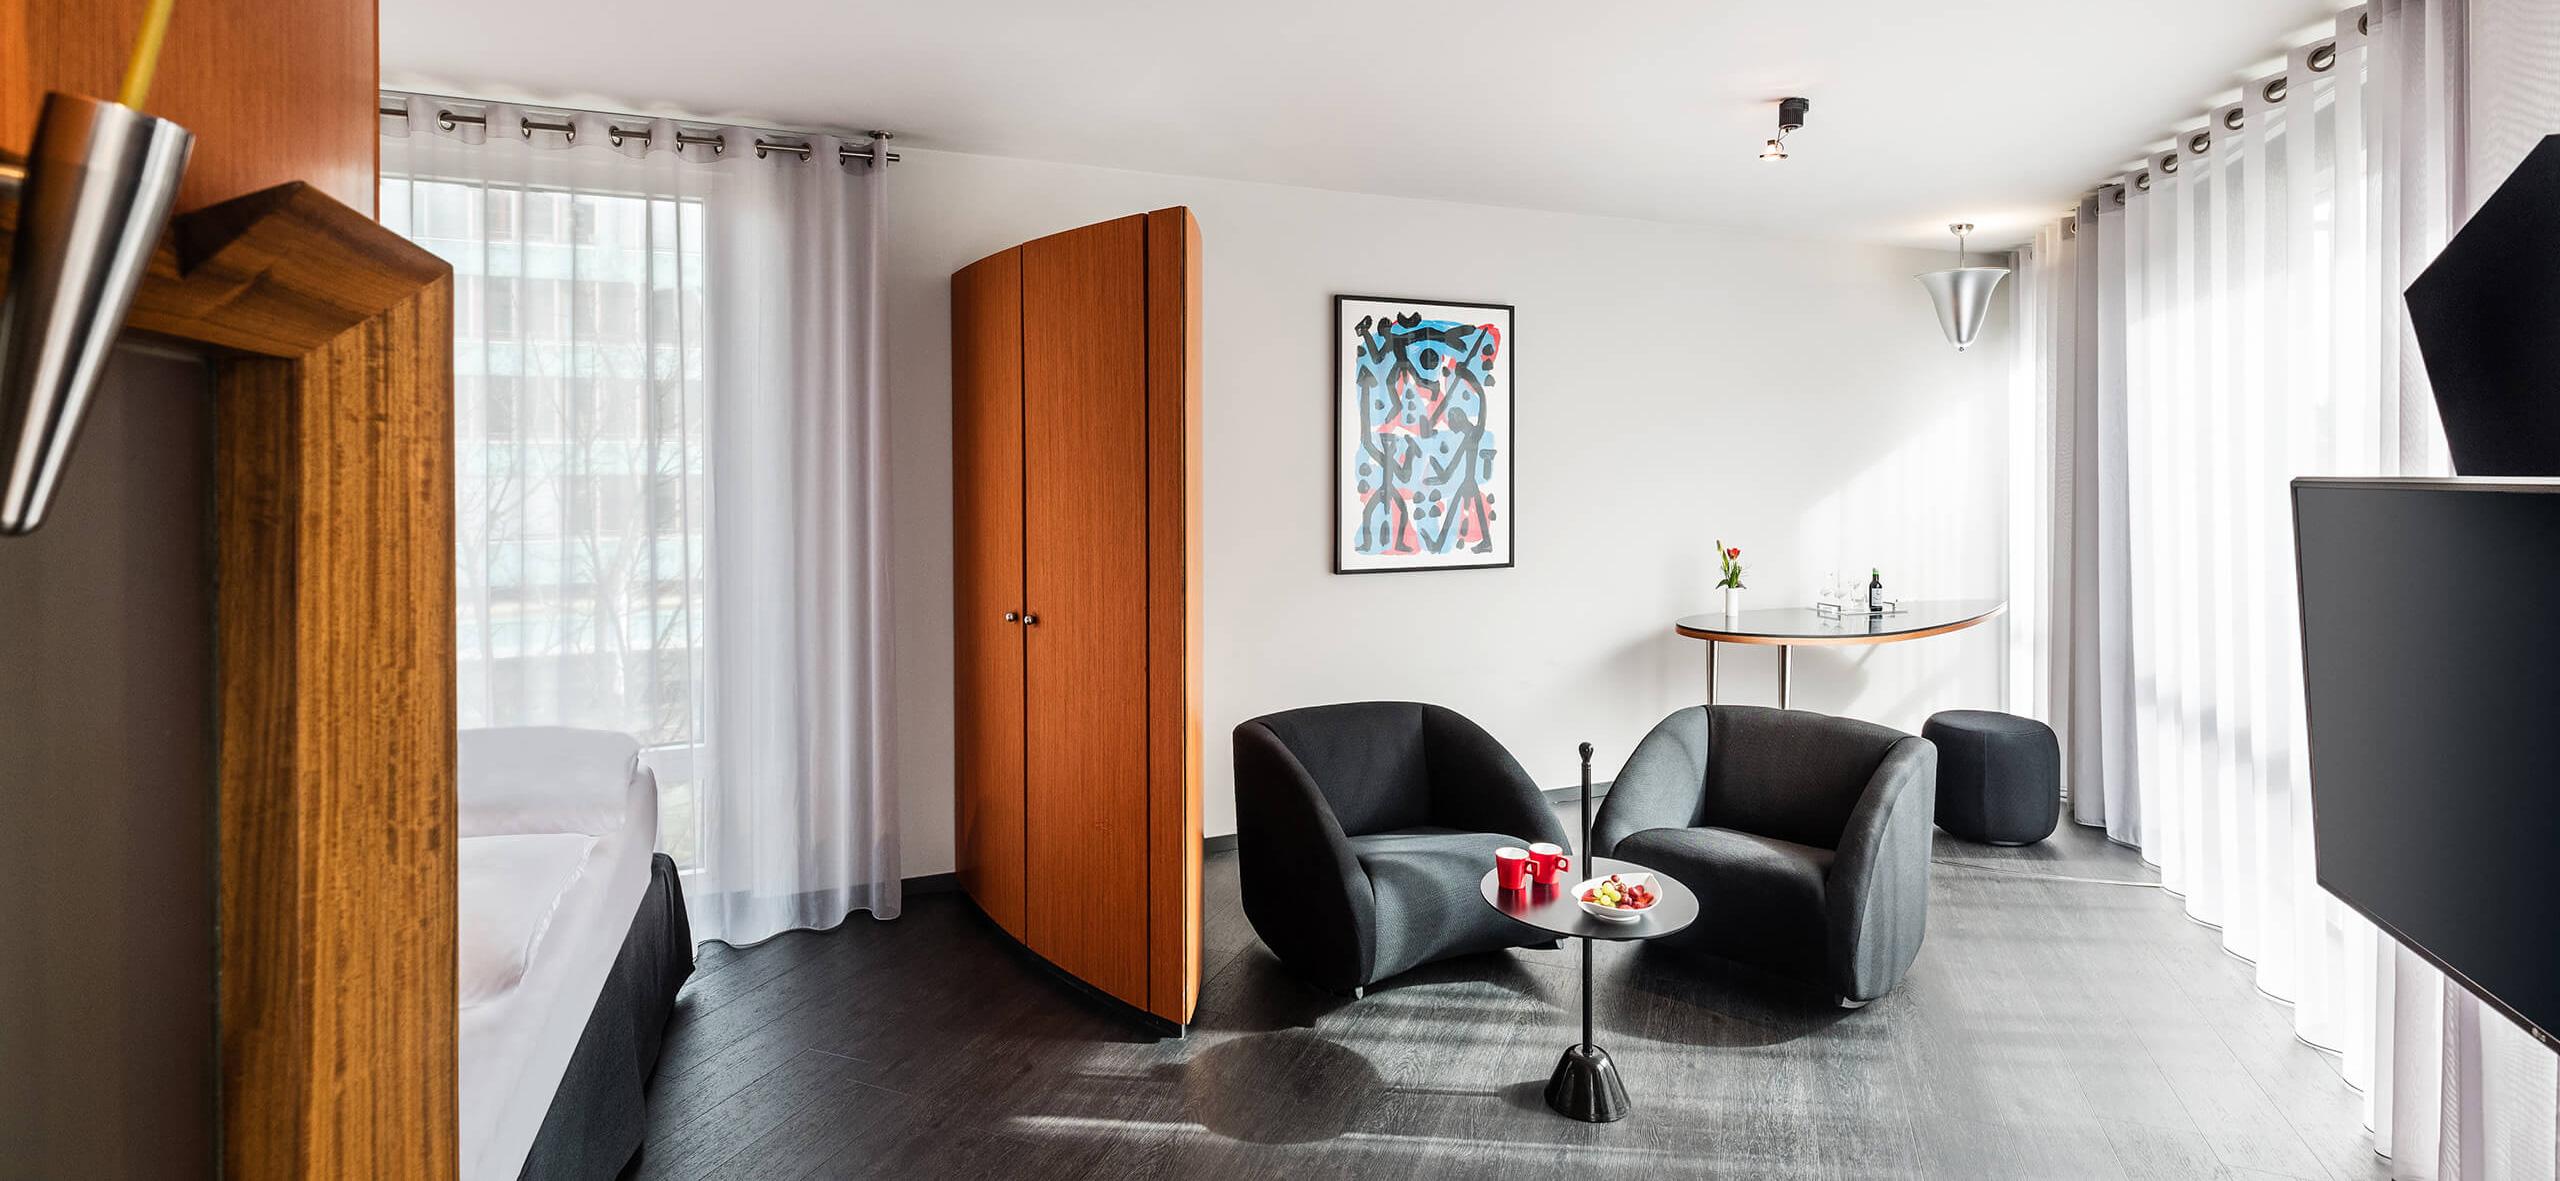 Penck-Hotel-Dresden-hygiene